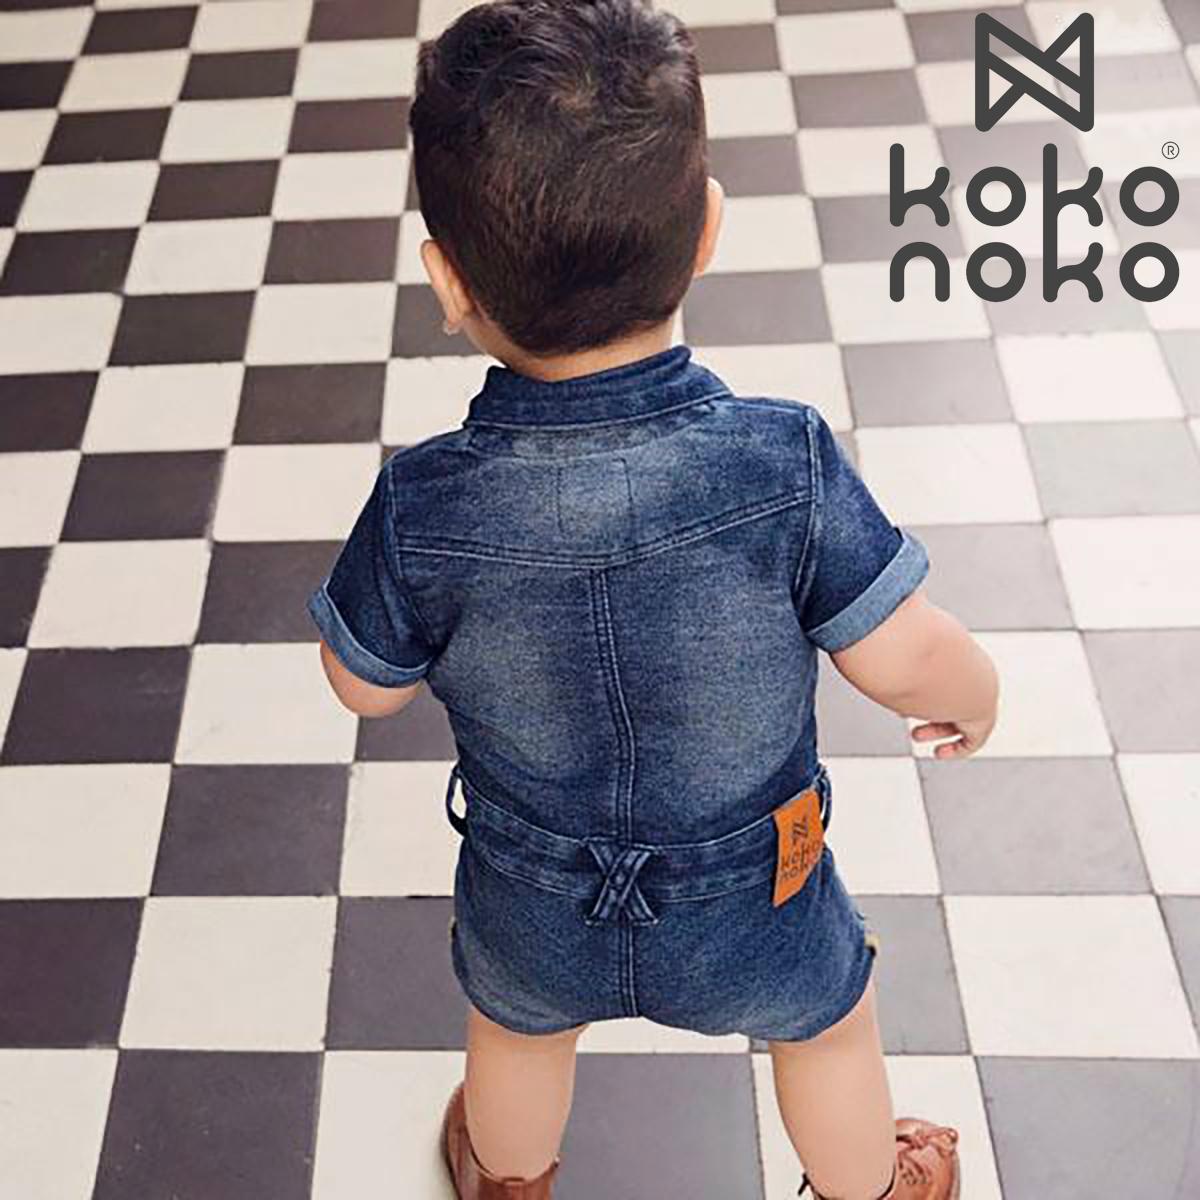 Koko Noko jeans pakje